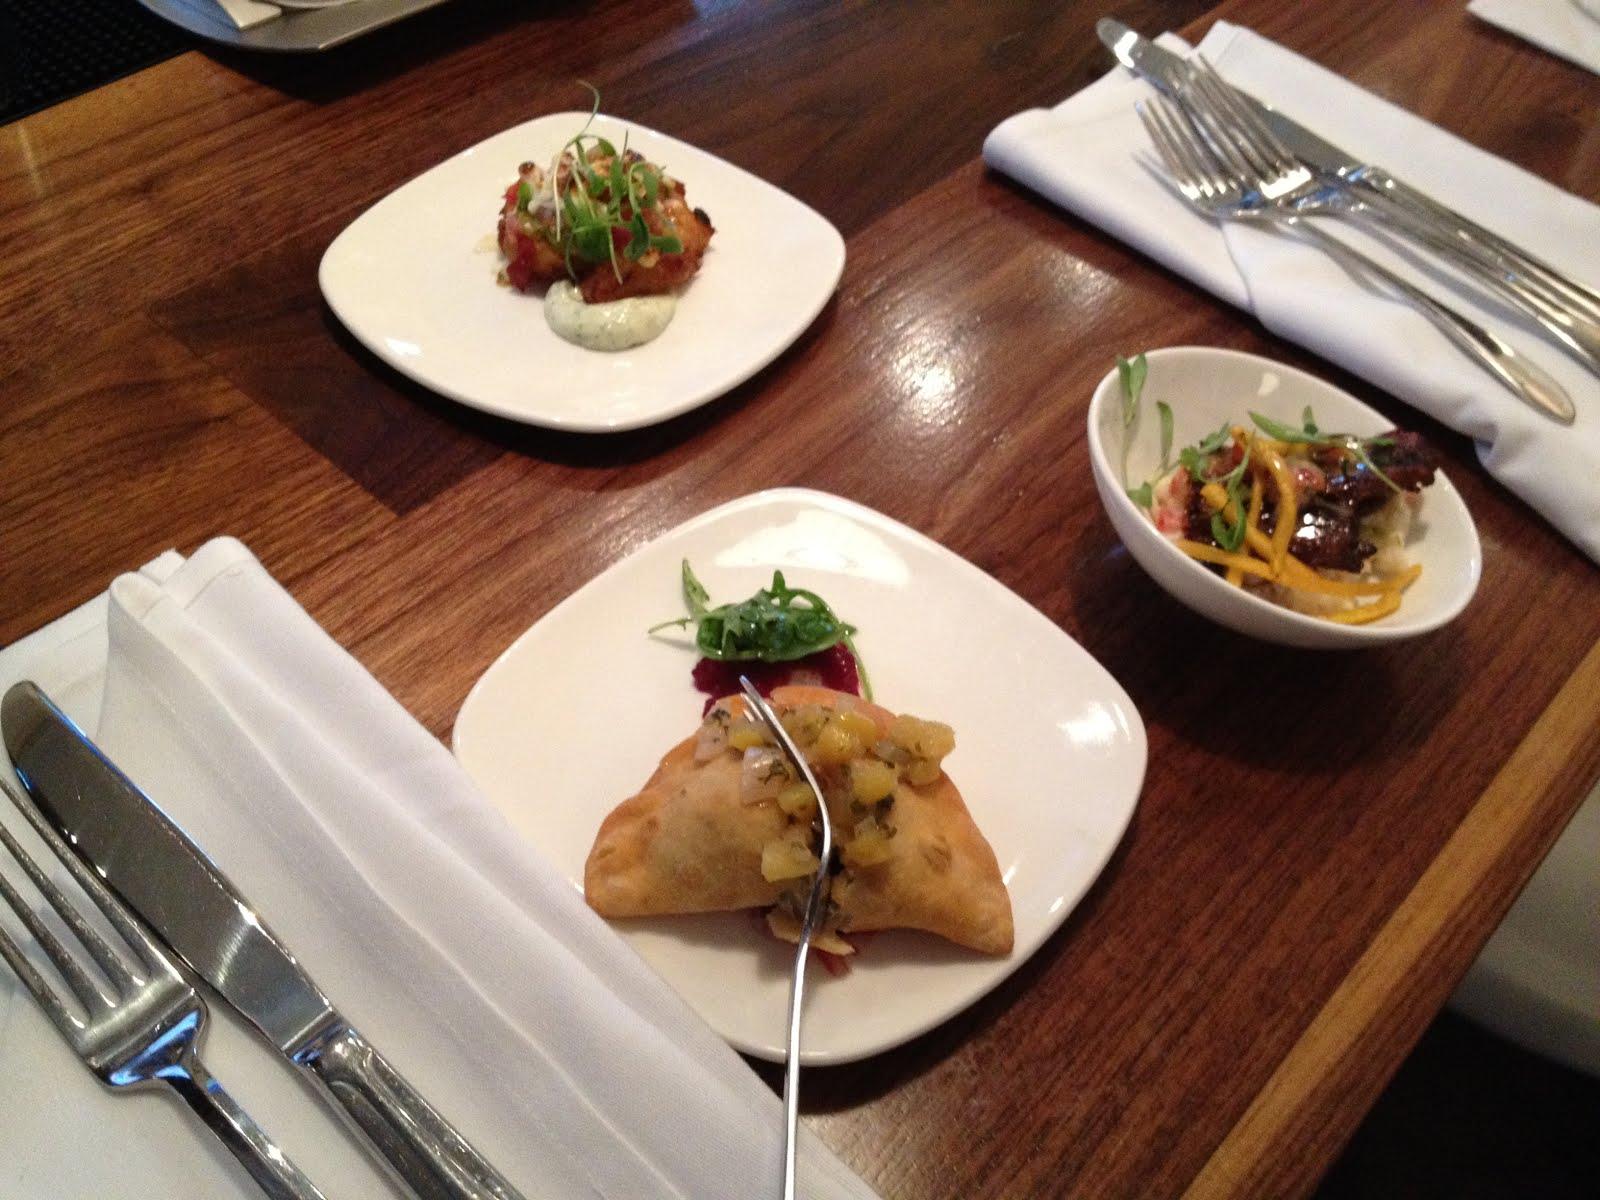 Lena S Cafe Melbourne Fl Menu